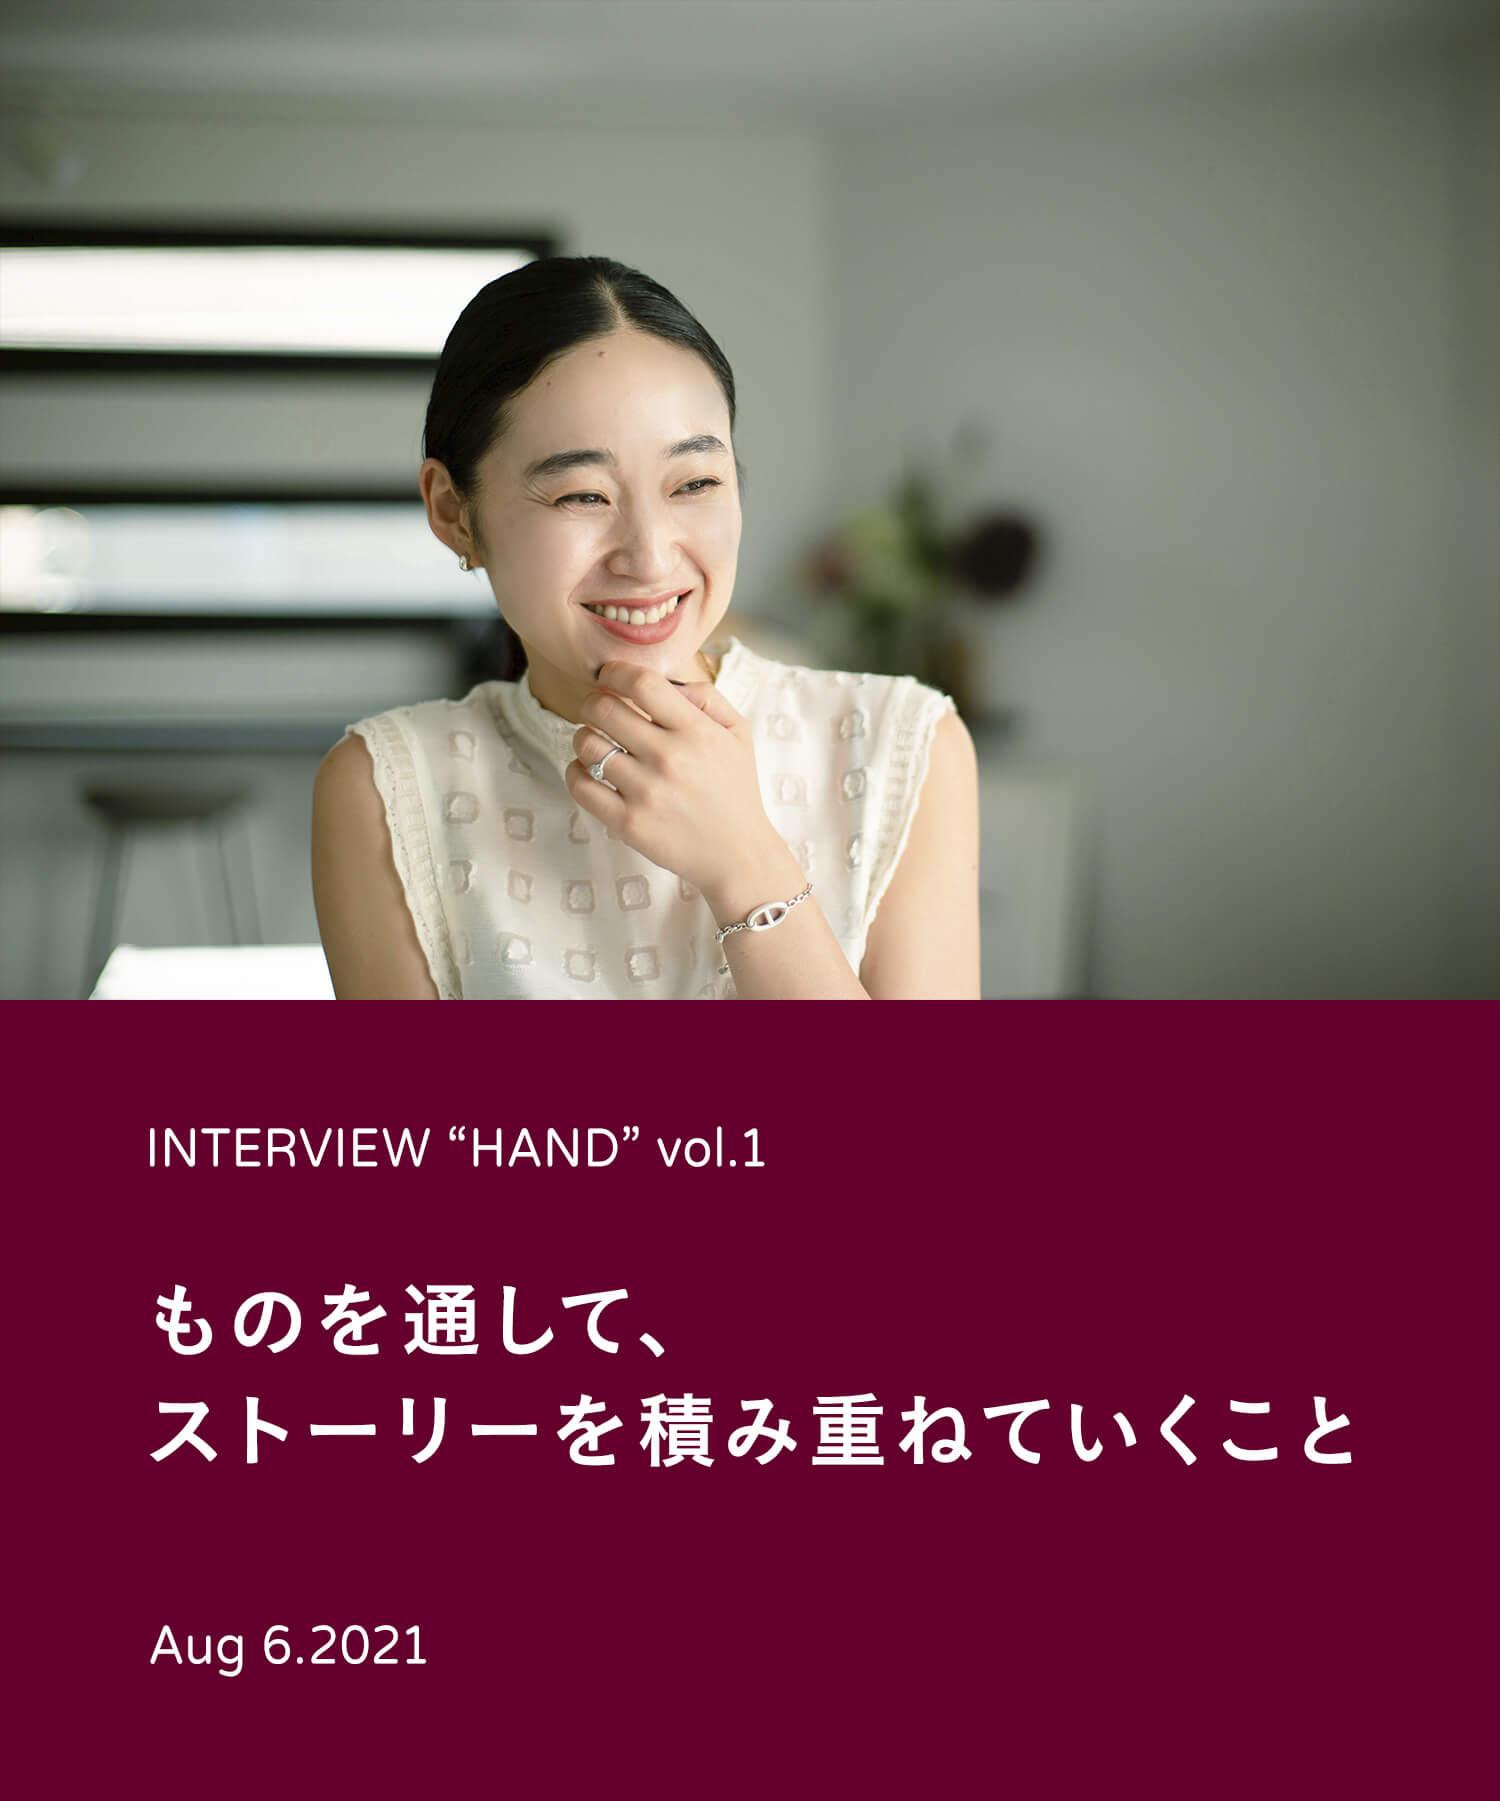 "INTERVIEW ""HAND"" vol.1 ものを通して、ストーリー積み重ねていくこと"